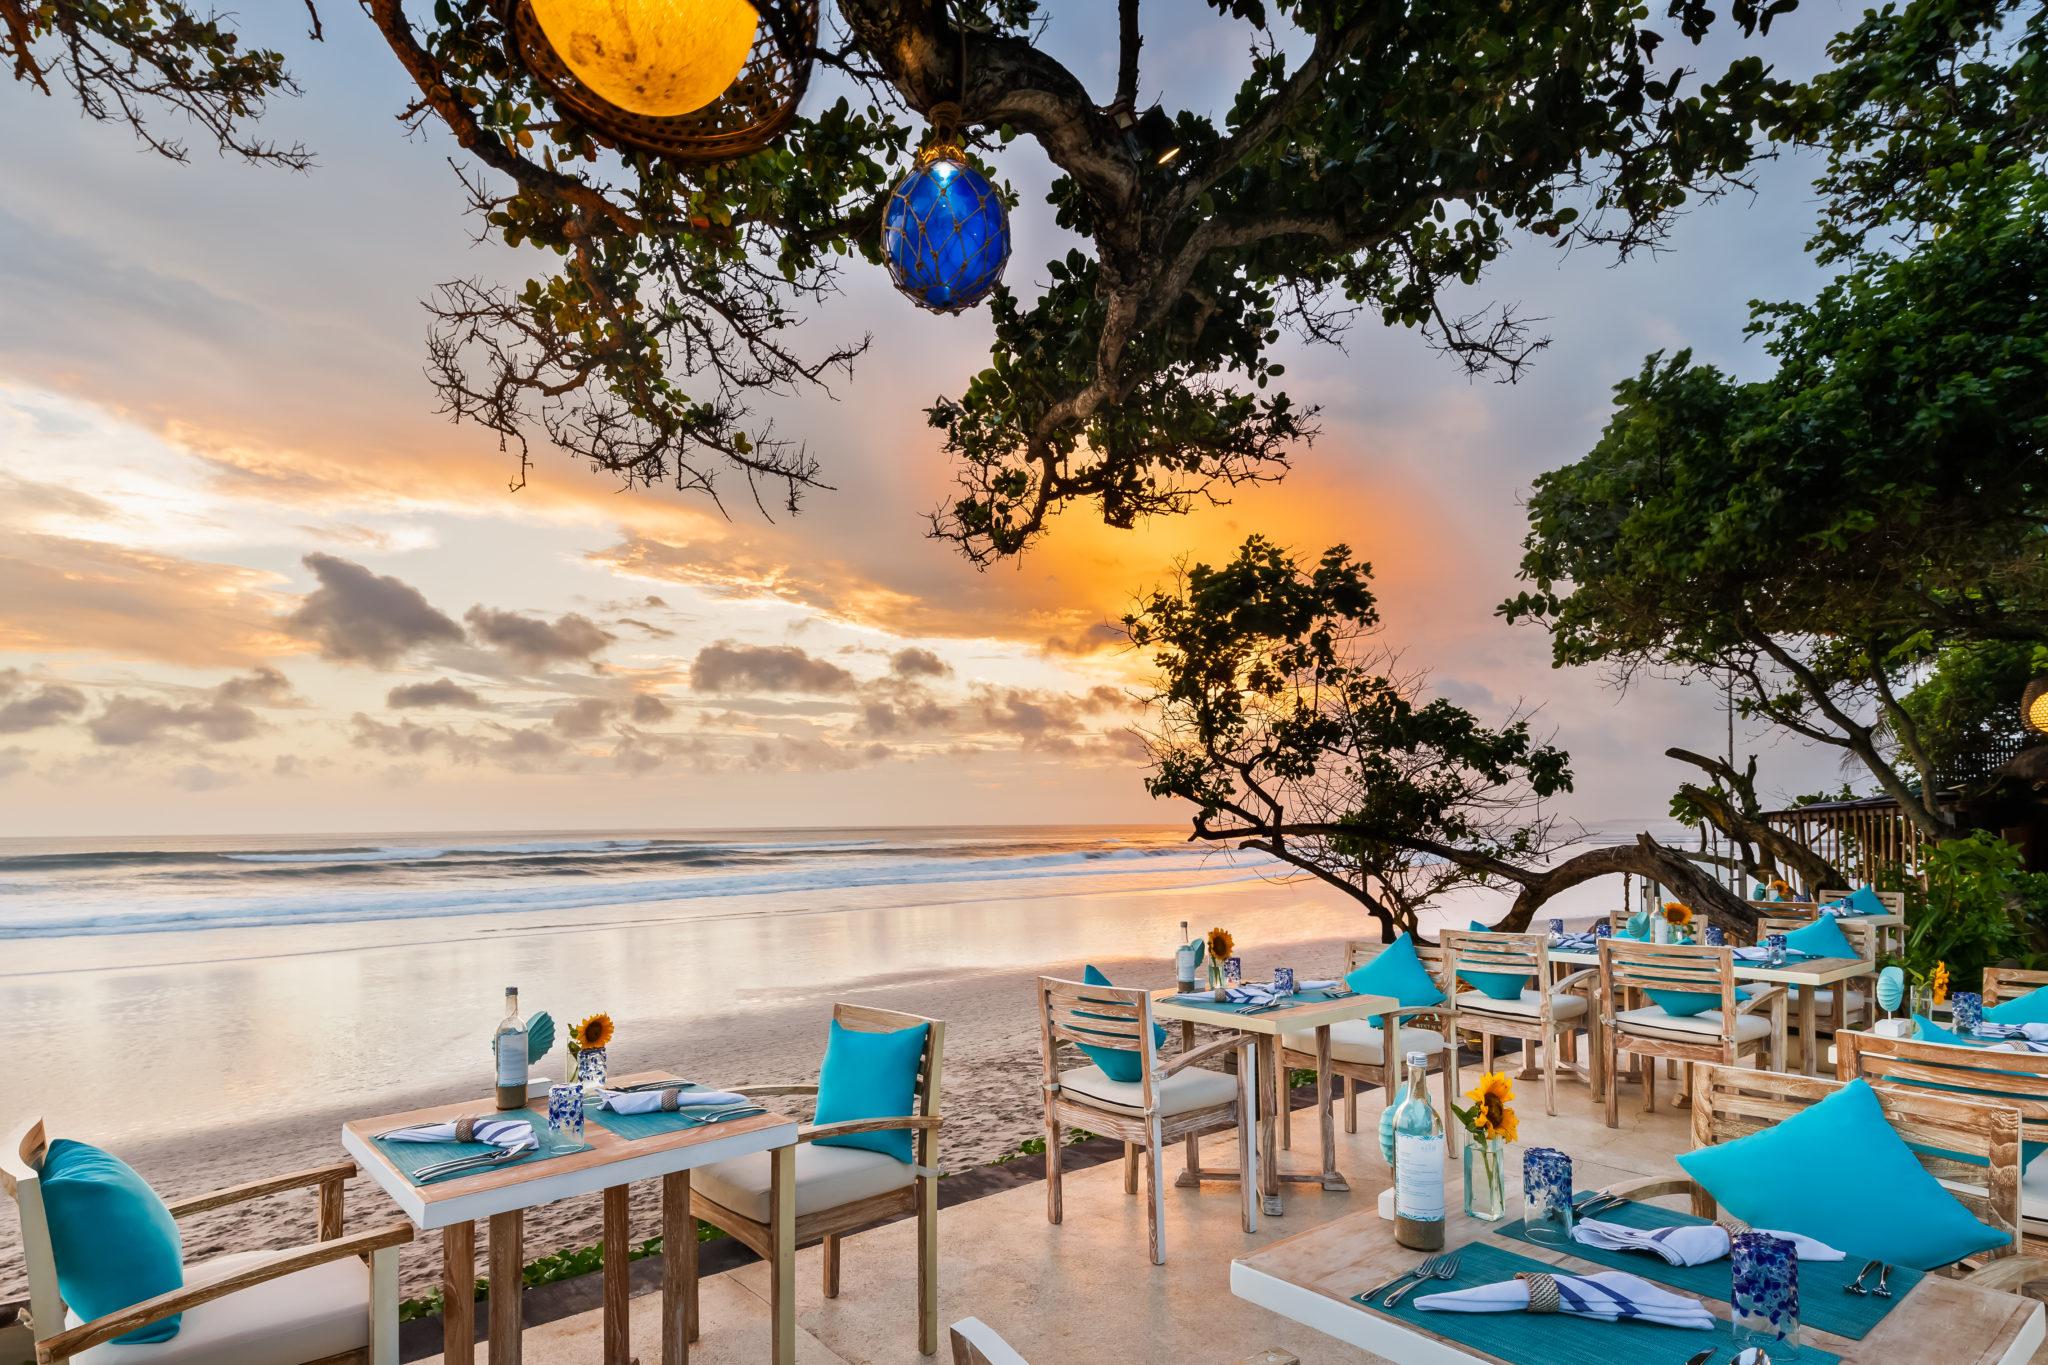 93966f2e4b085f2b org - A Destination Wedding of your Dreams at The Seminyak Beach Resort & Spa, Bali